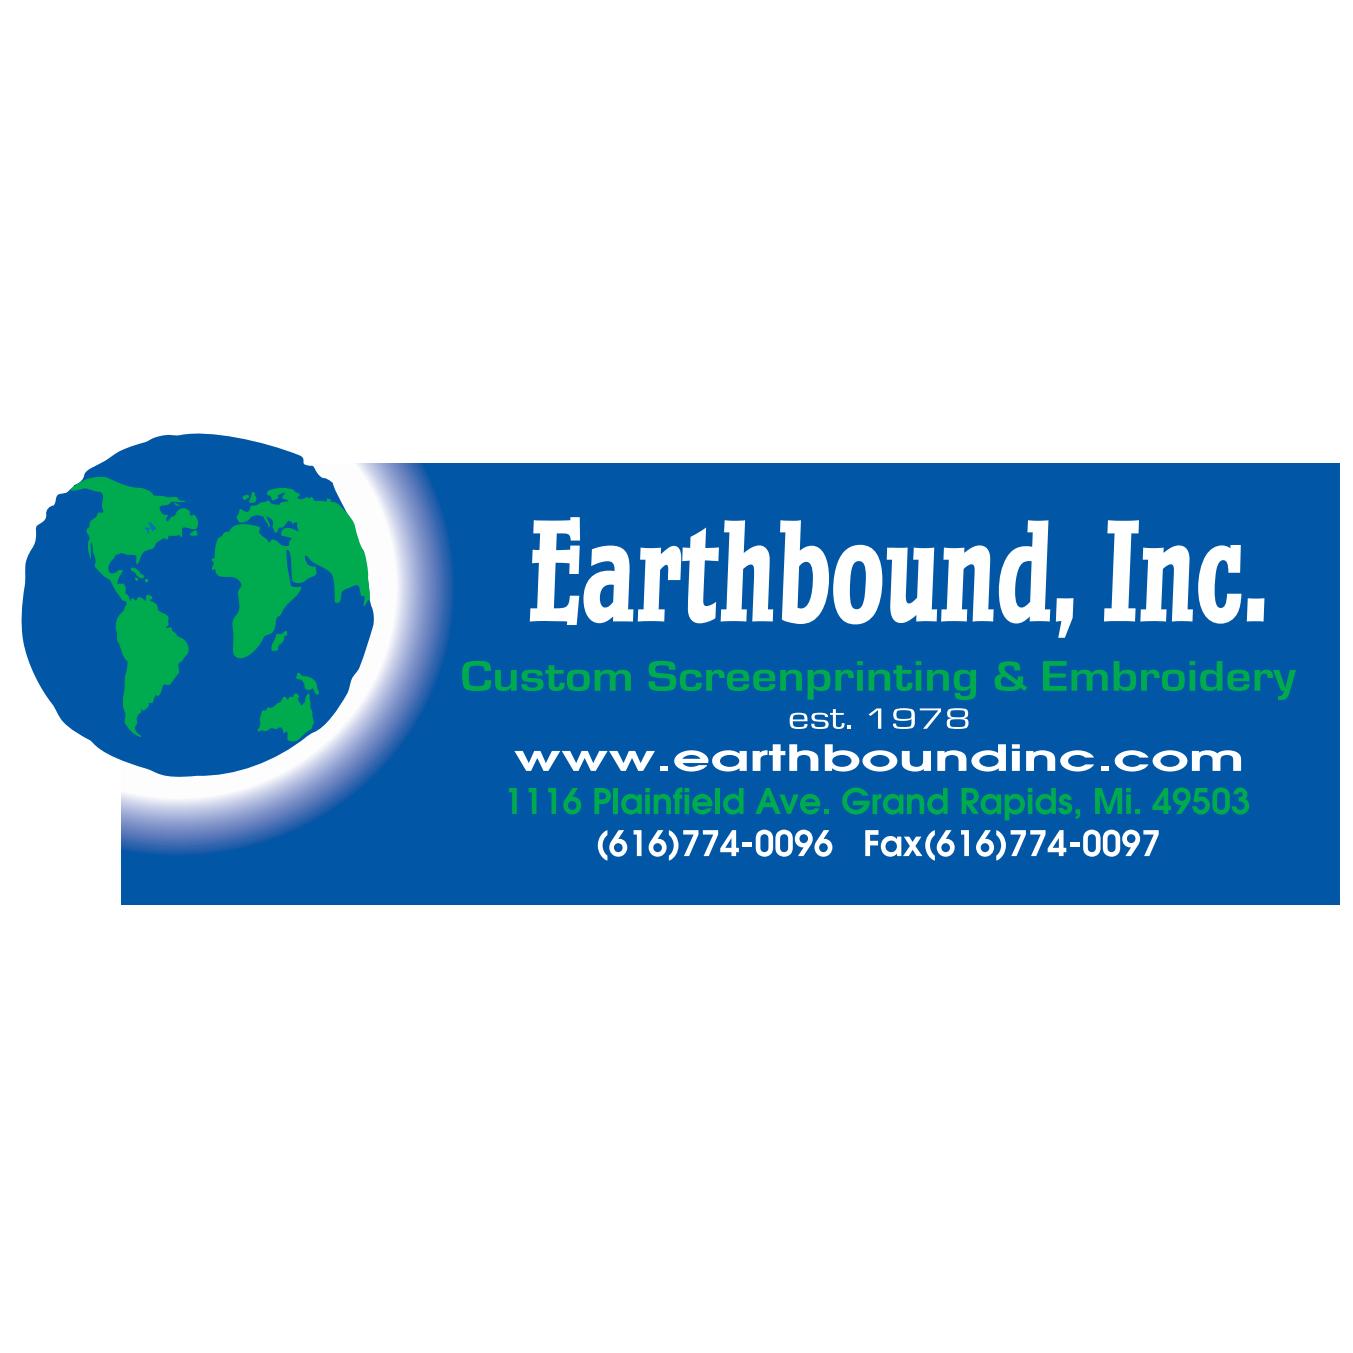 Earthbound, Inc.